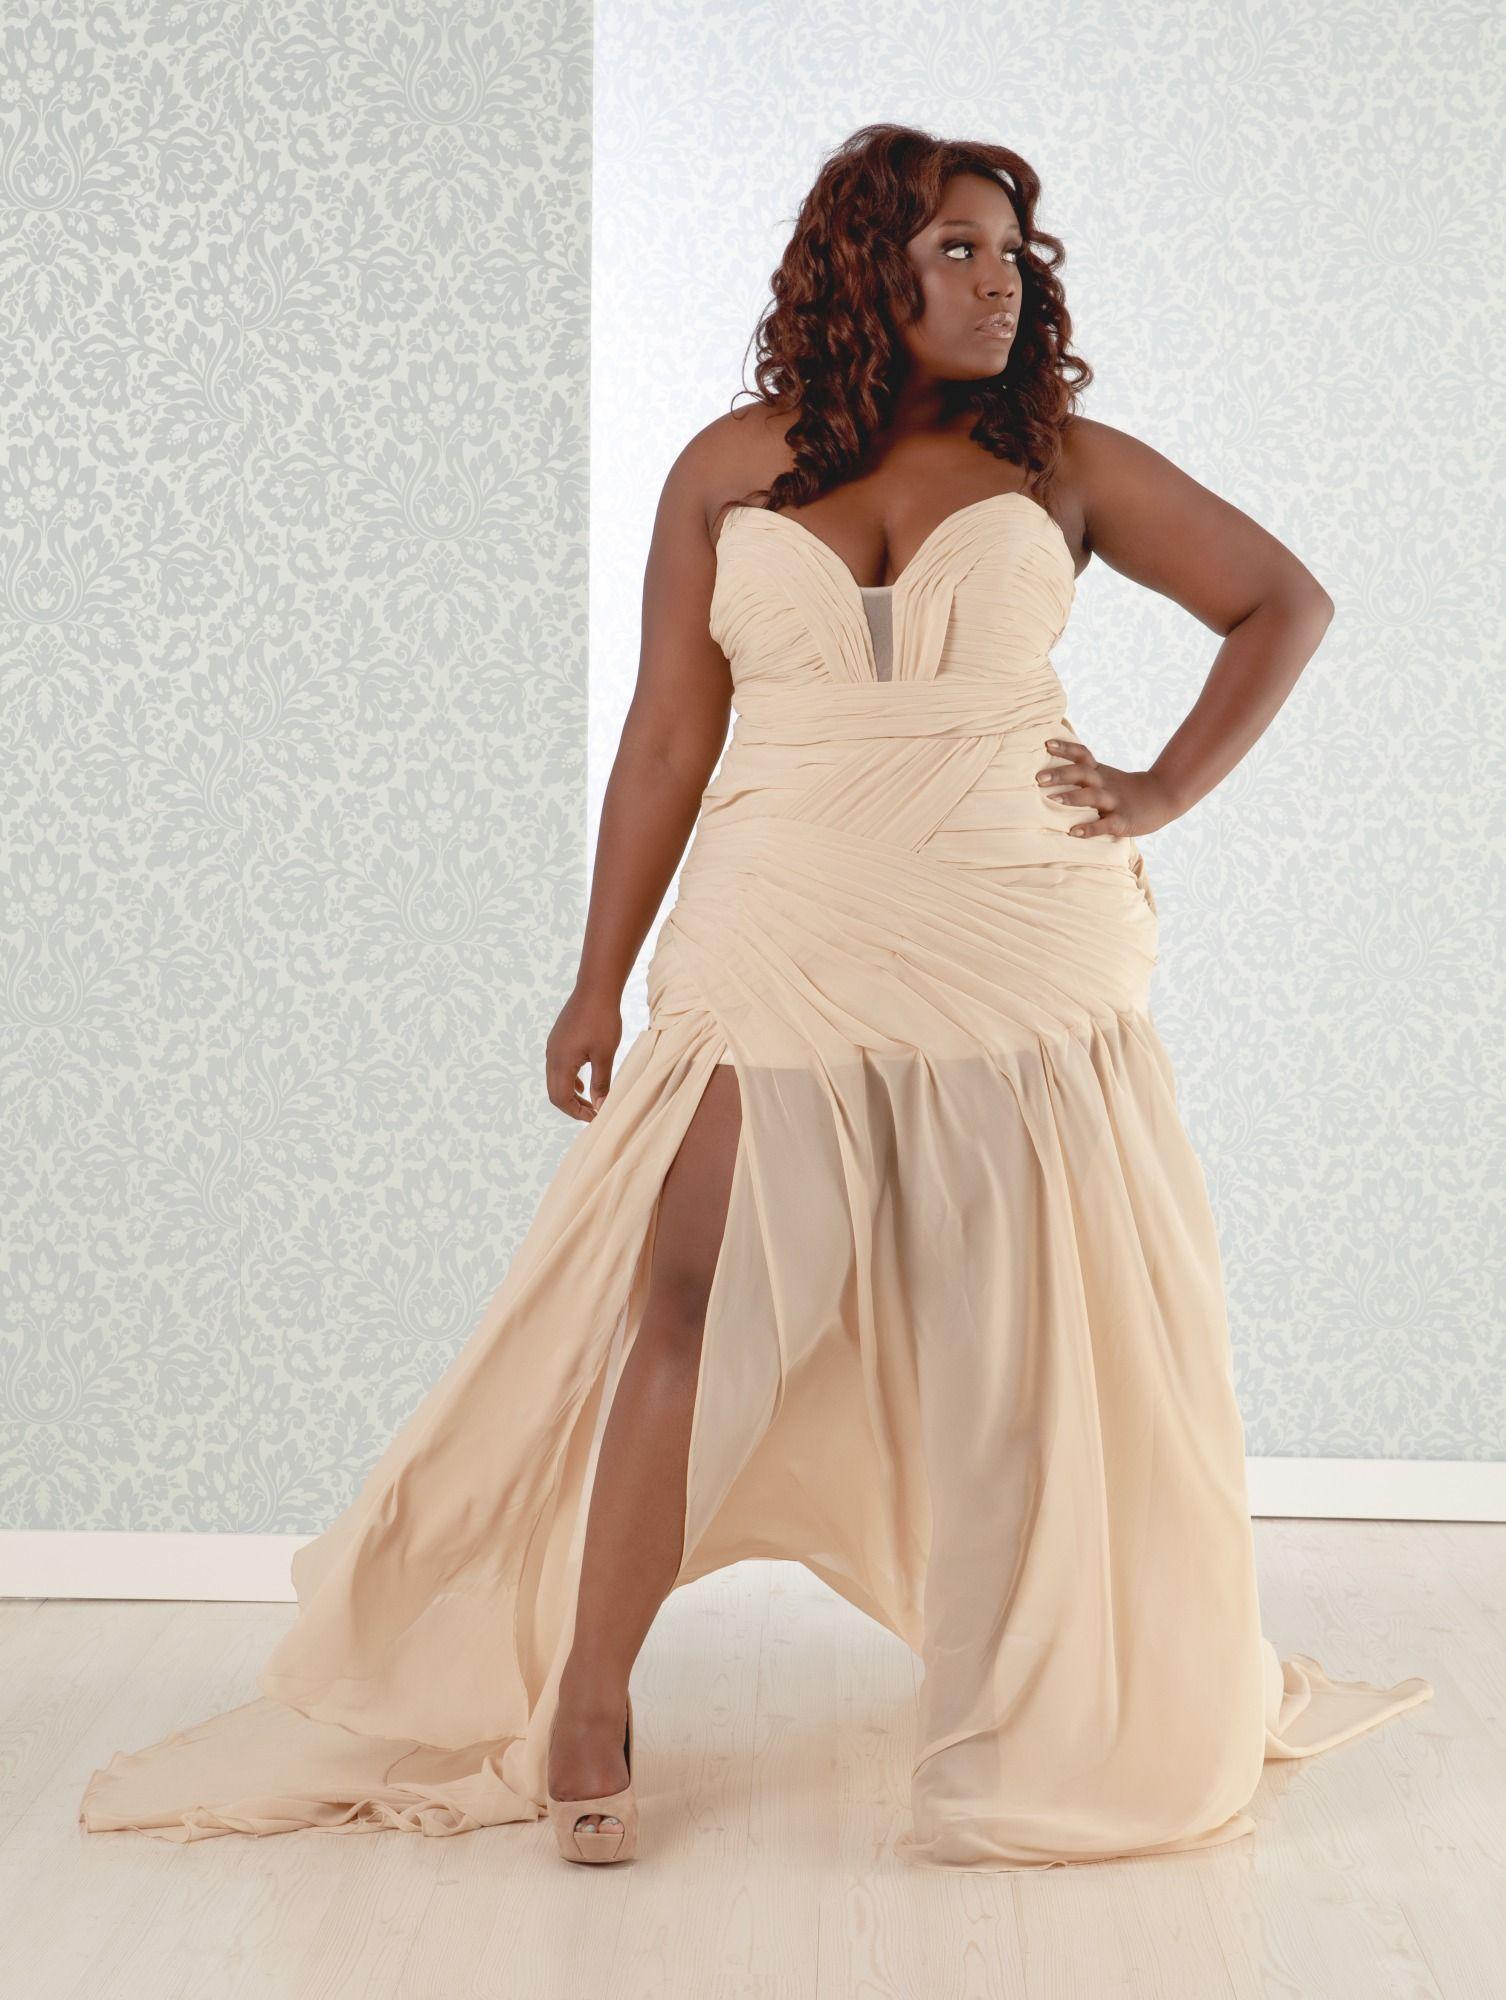 Pin On 11 12 13 Wedding Dress [ 2000 x 1506 Pixel ]